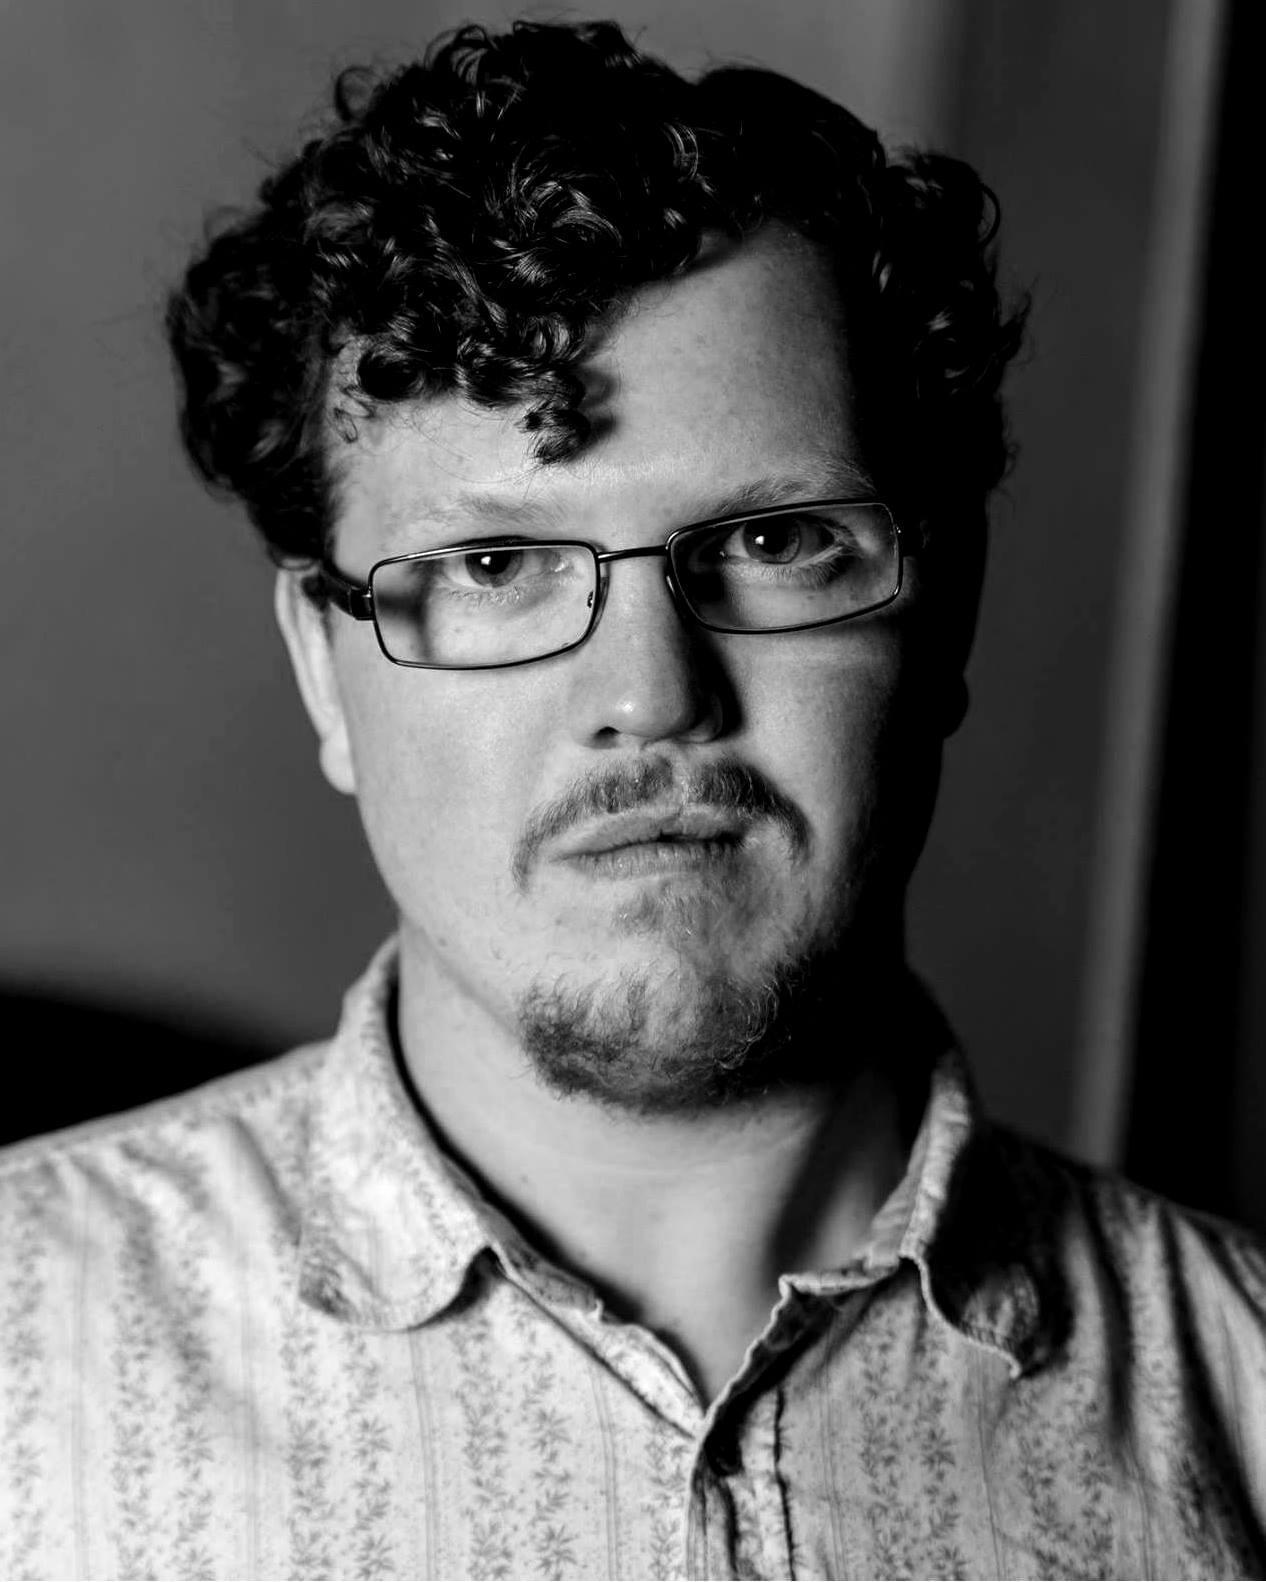 Artistic Director Chris Cutting